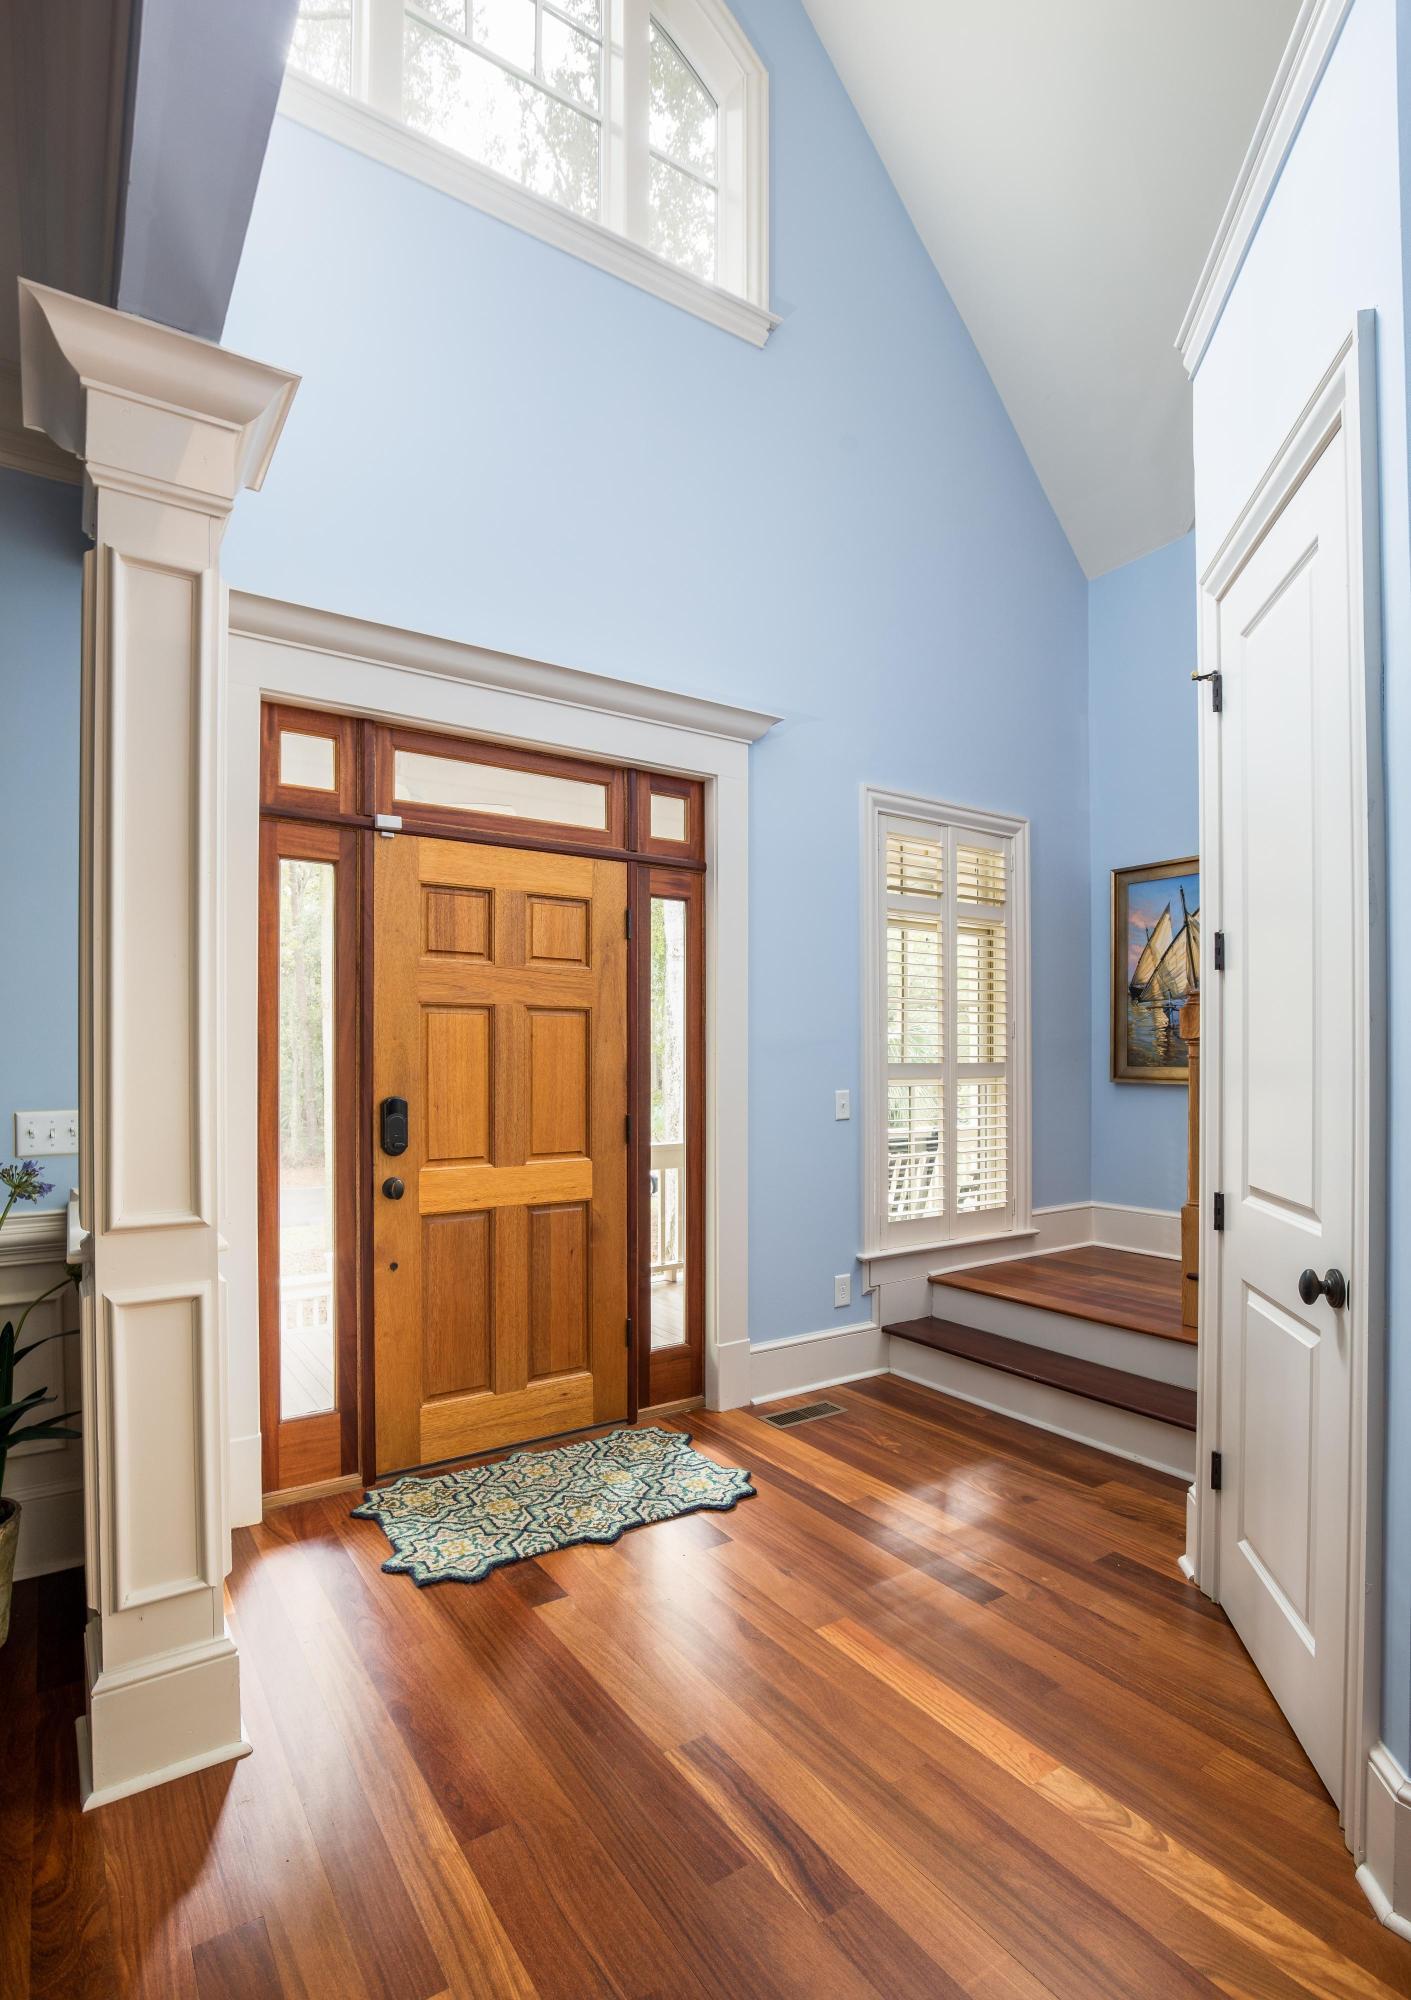 Seabrook Island Homes For Sale - 3125 Baywood, Seabrook Island, SC - 22